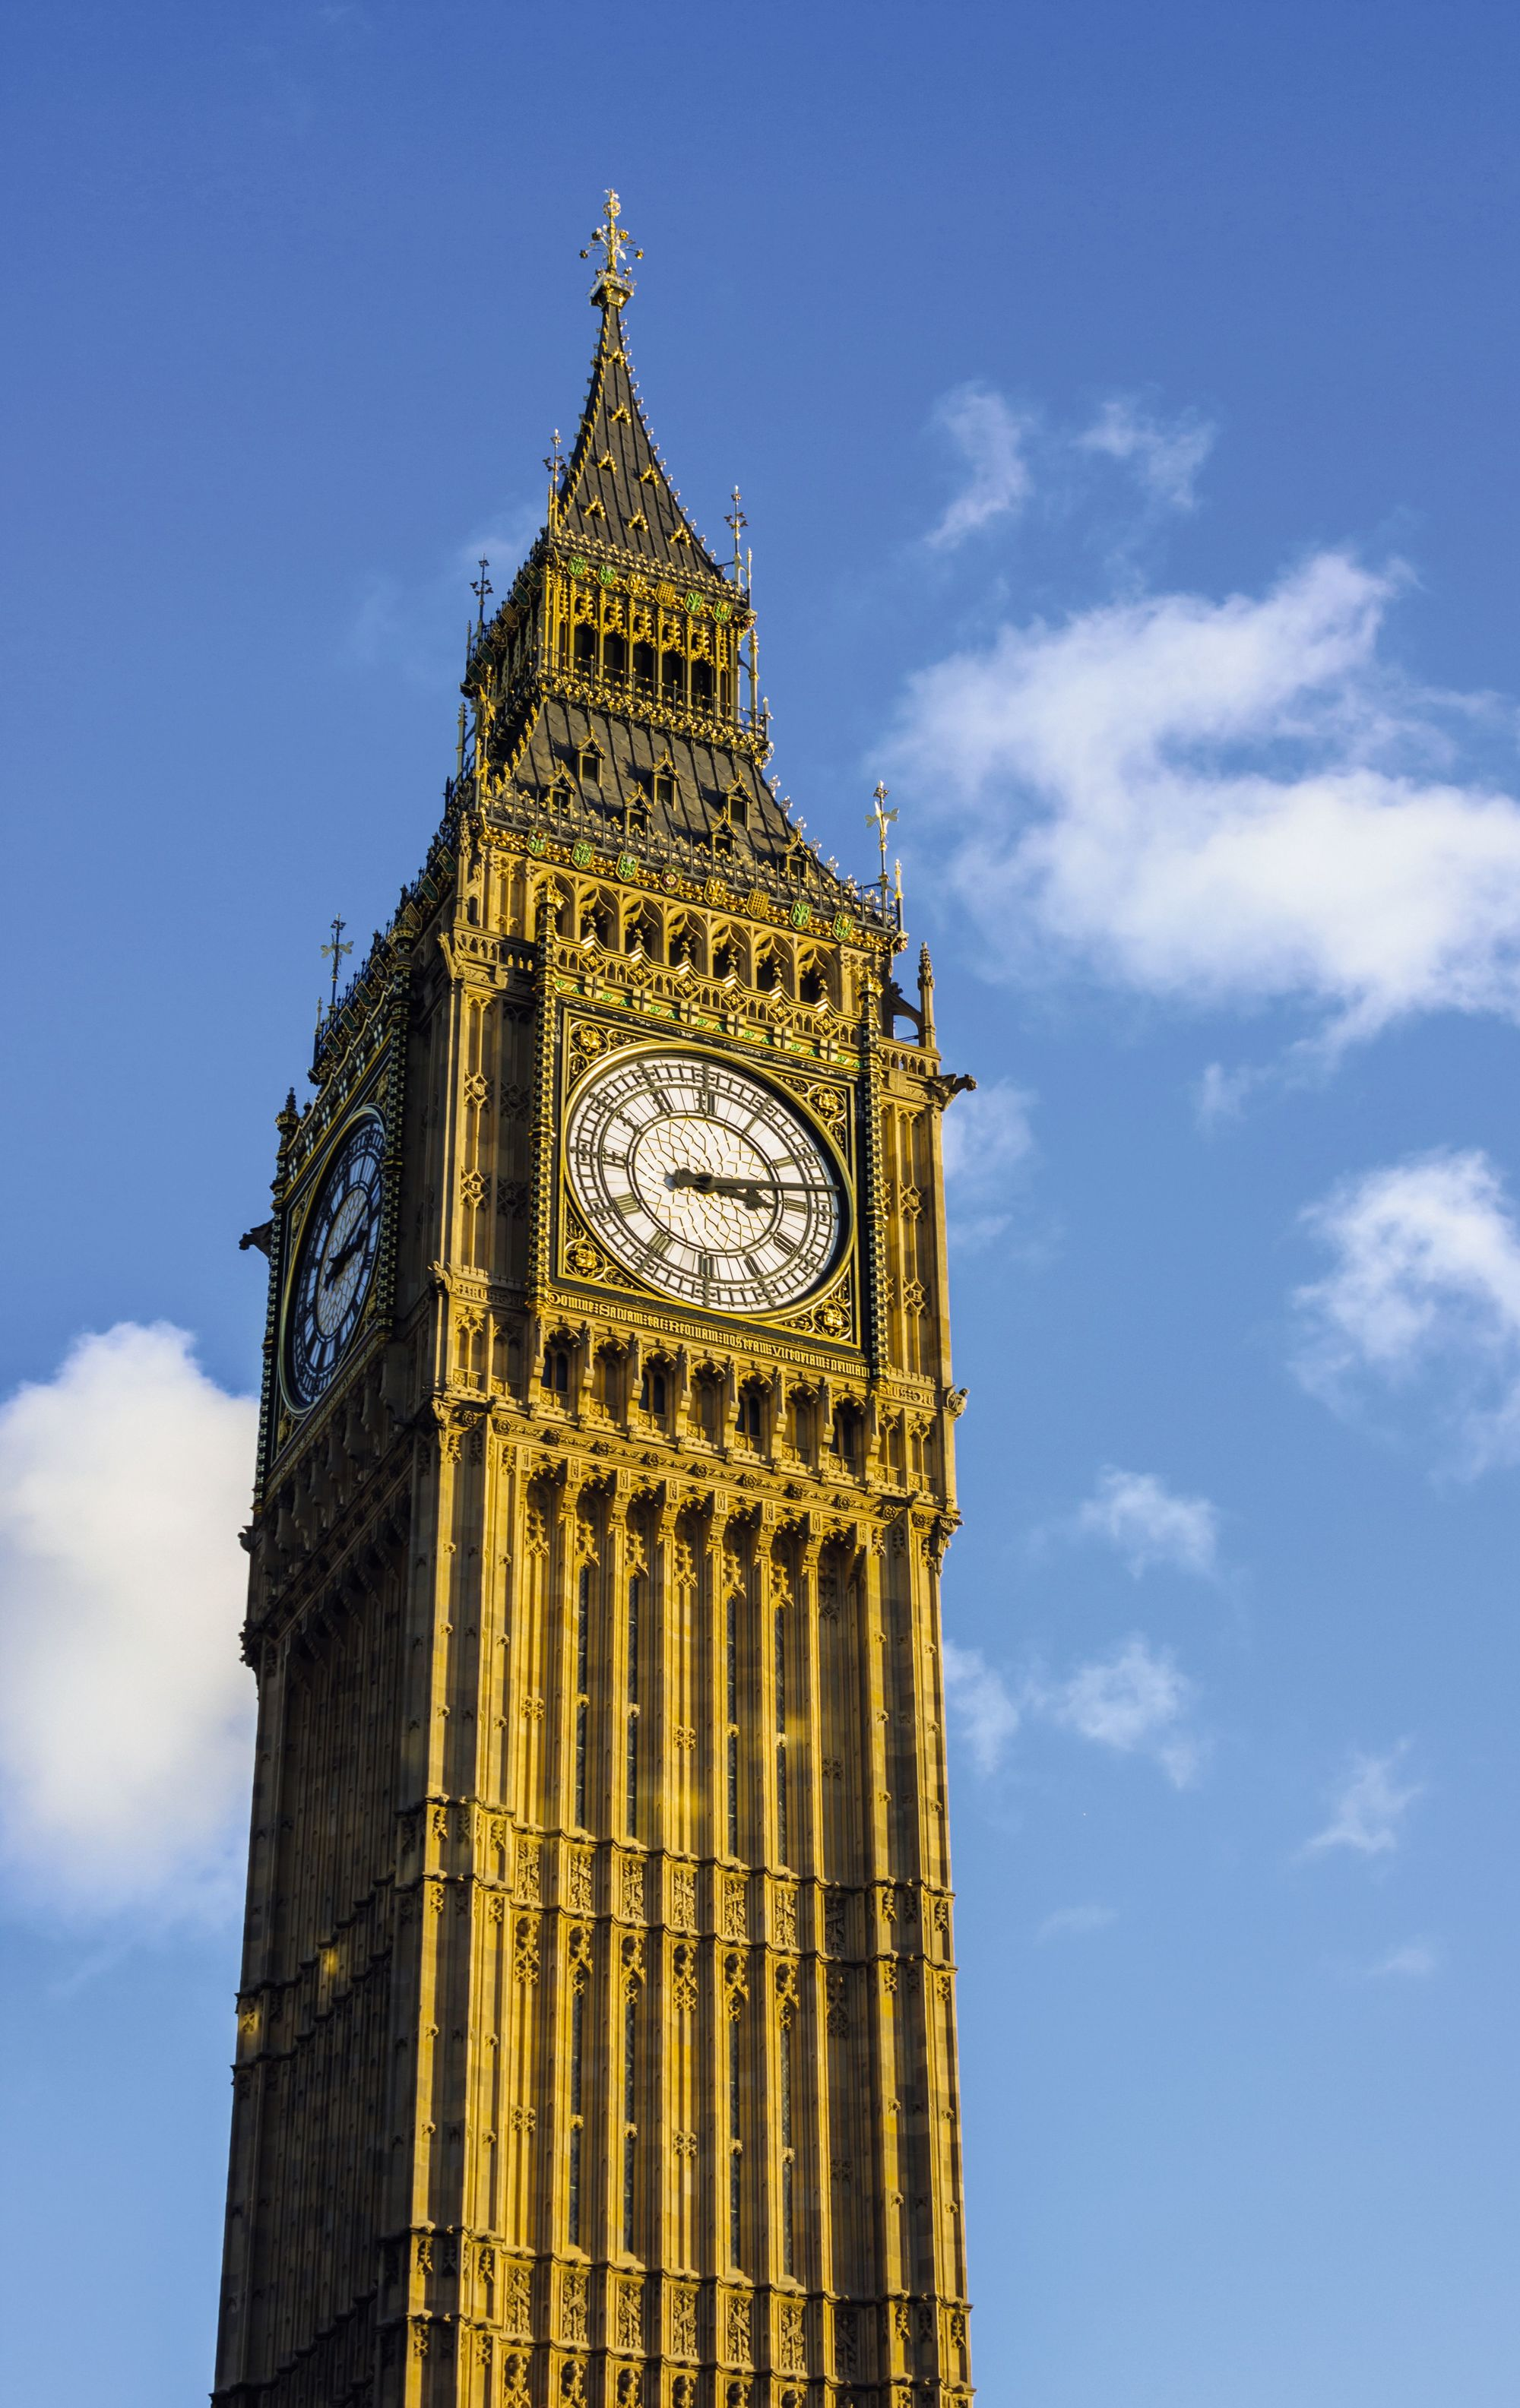 Mesurer un angle en radian - Big Ben